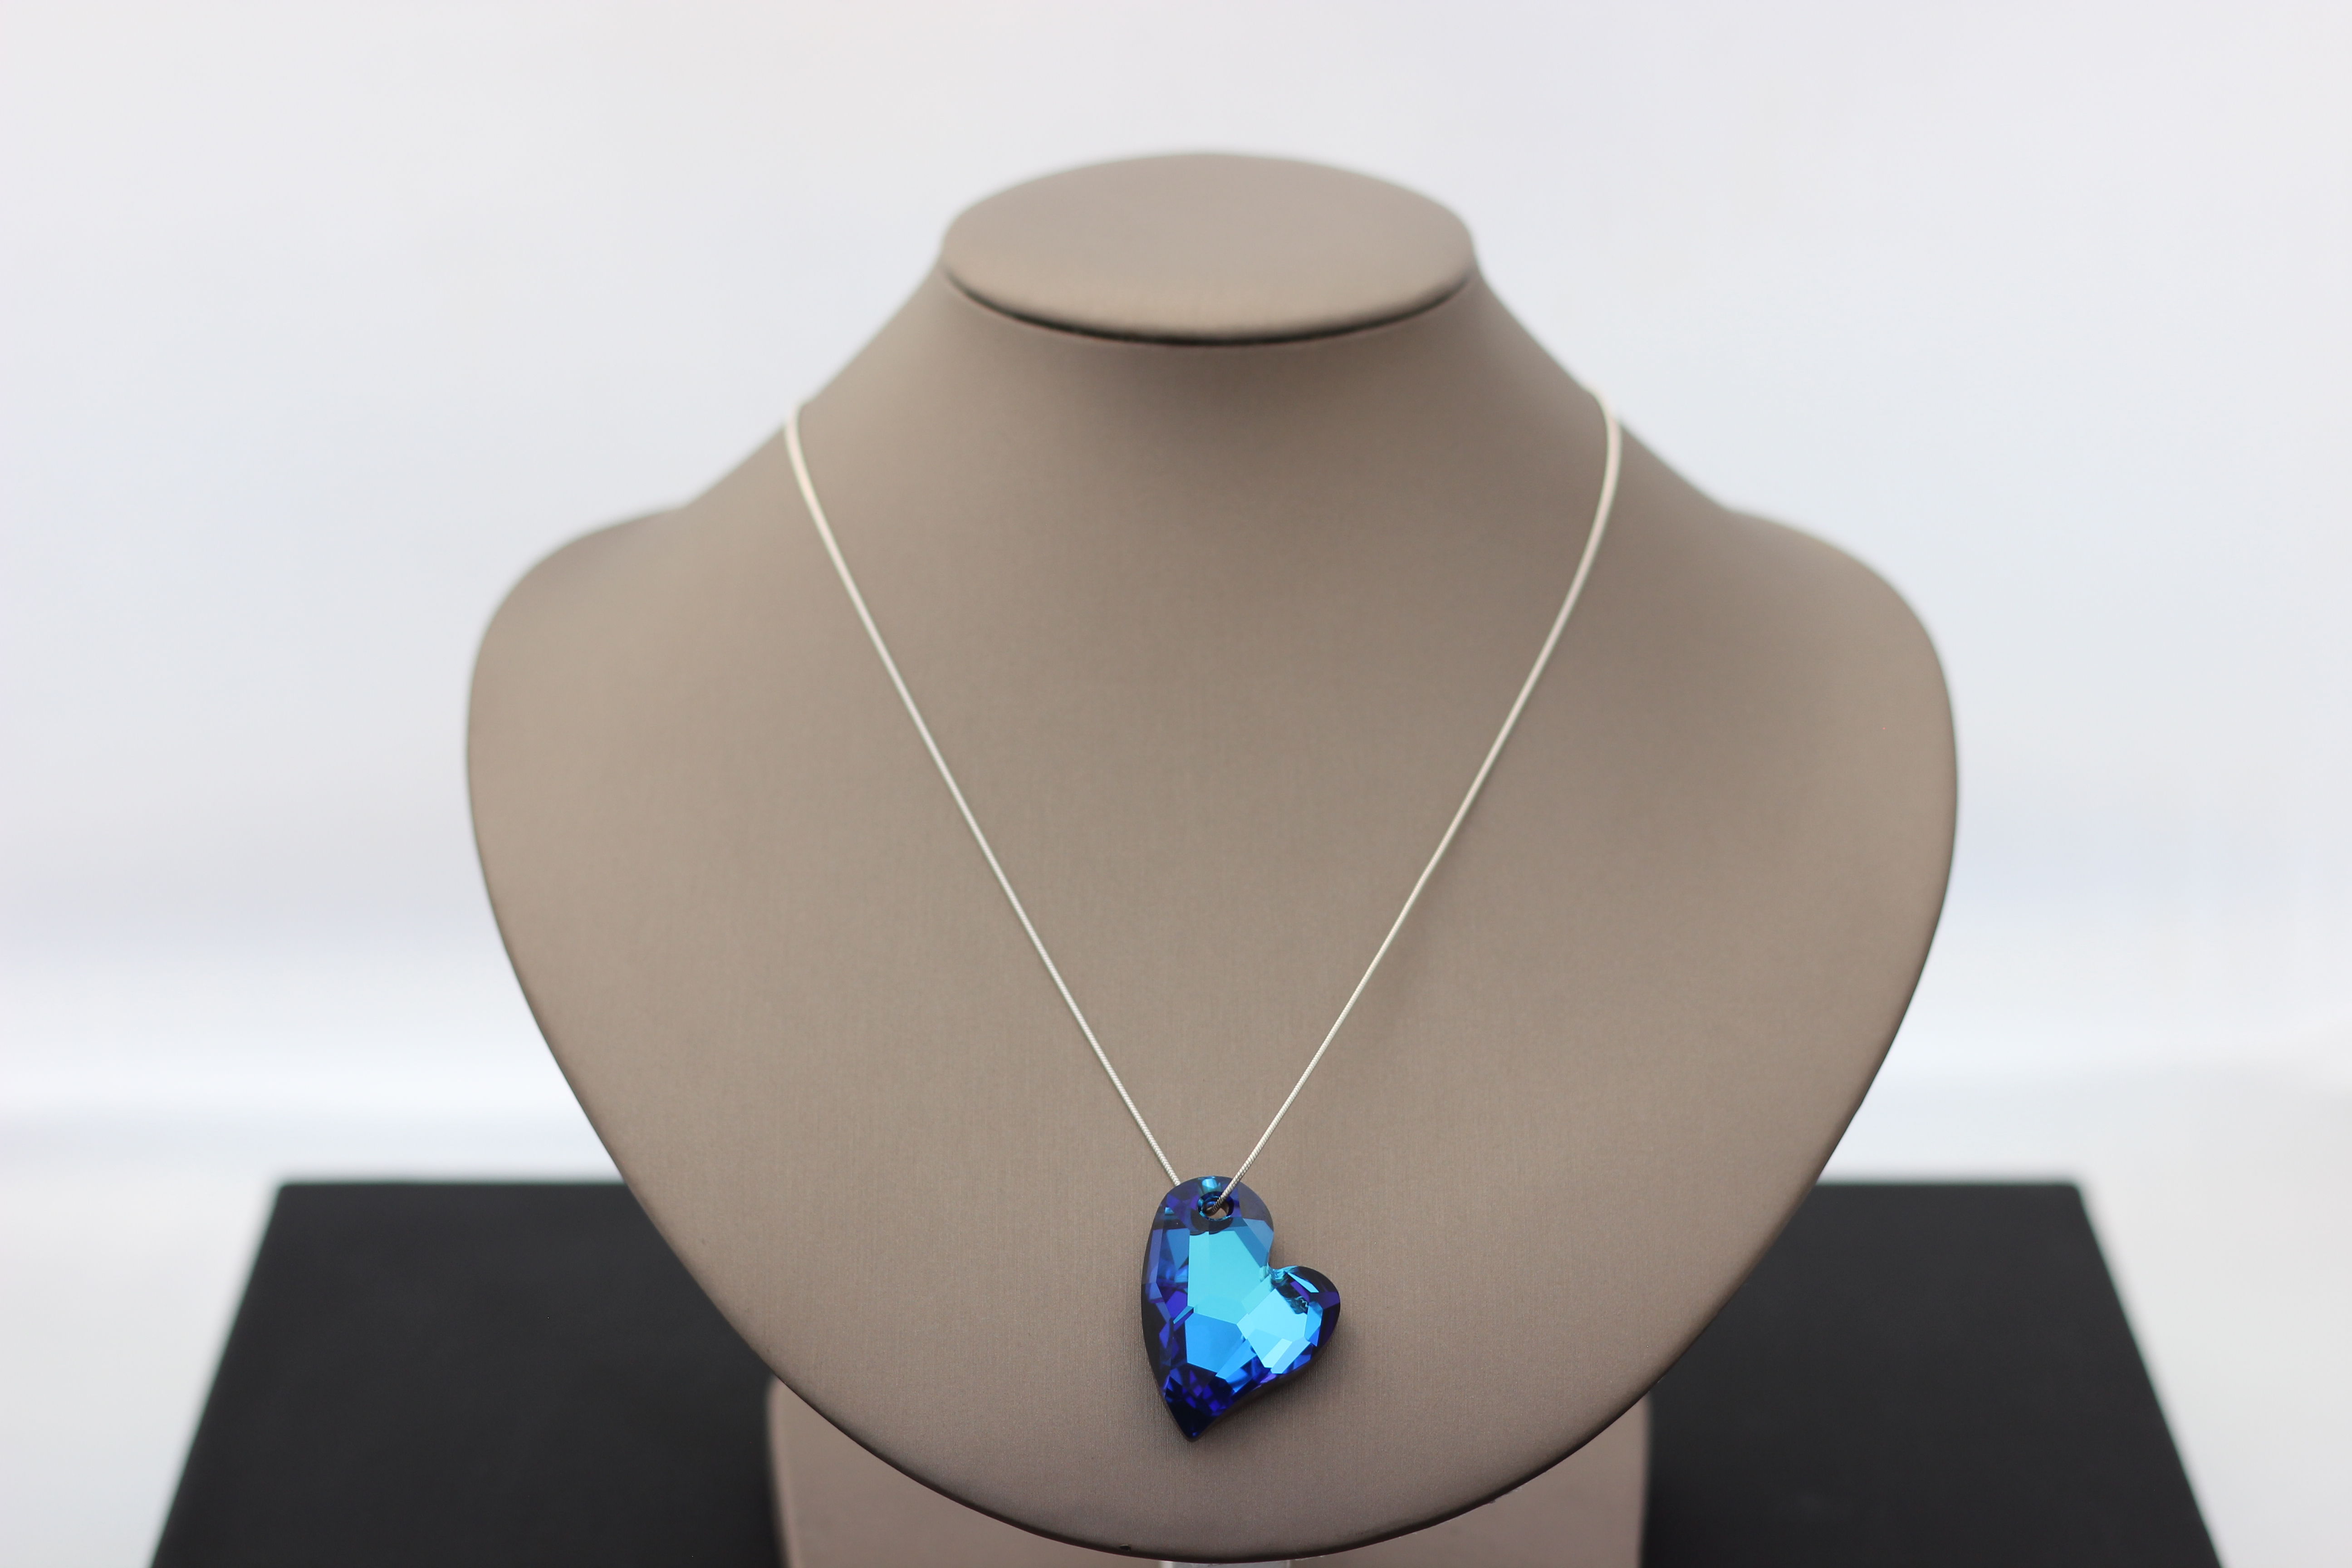 20. Reversible Blue/Slate Swarovski Wild Heart | $168